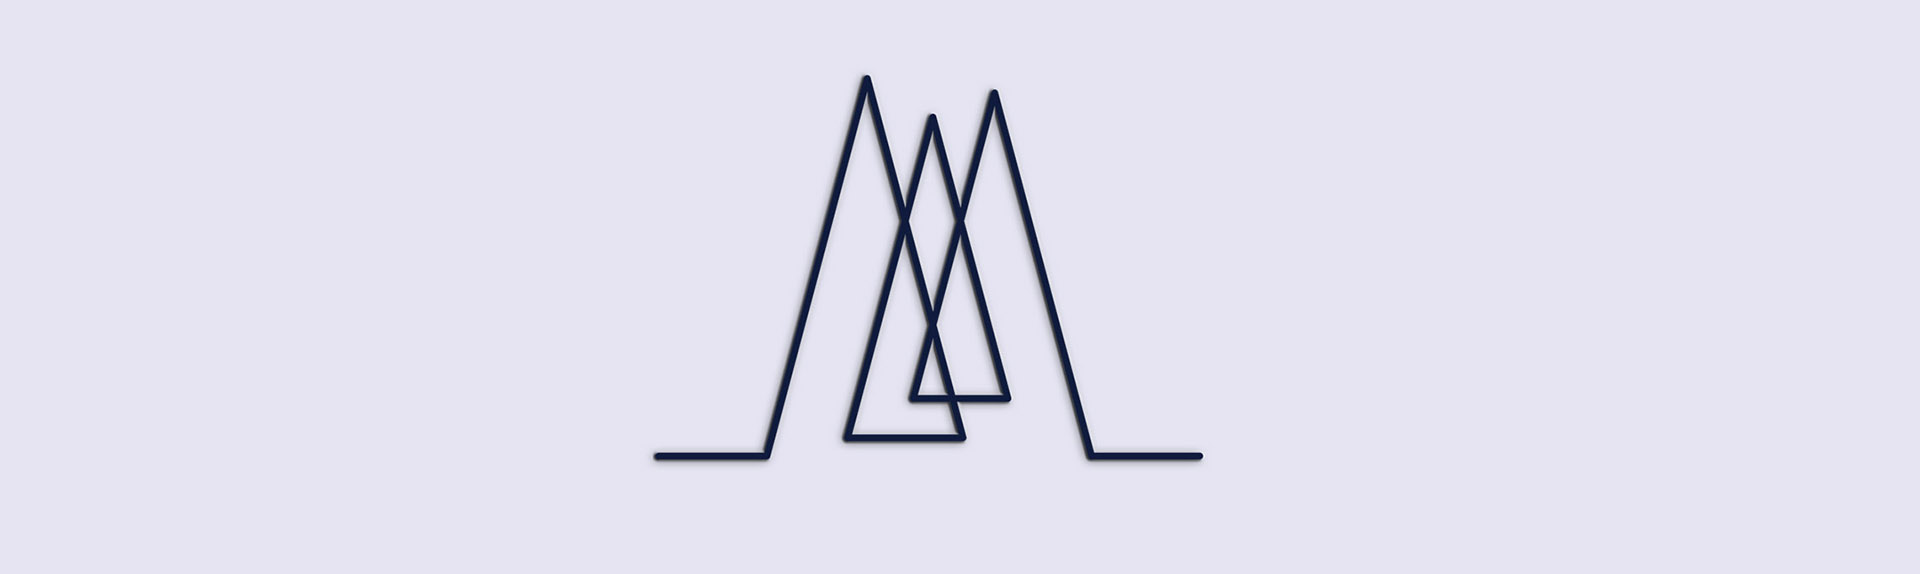 premios anuaria - beusual - diseno santander -picos de europa